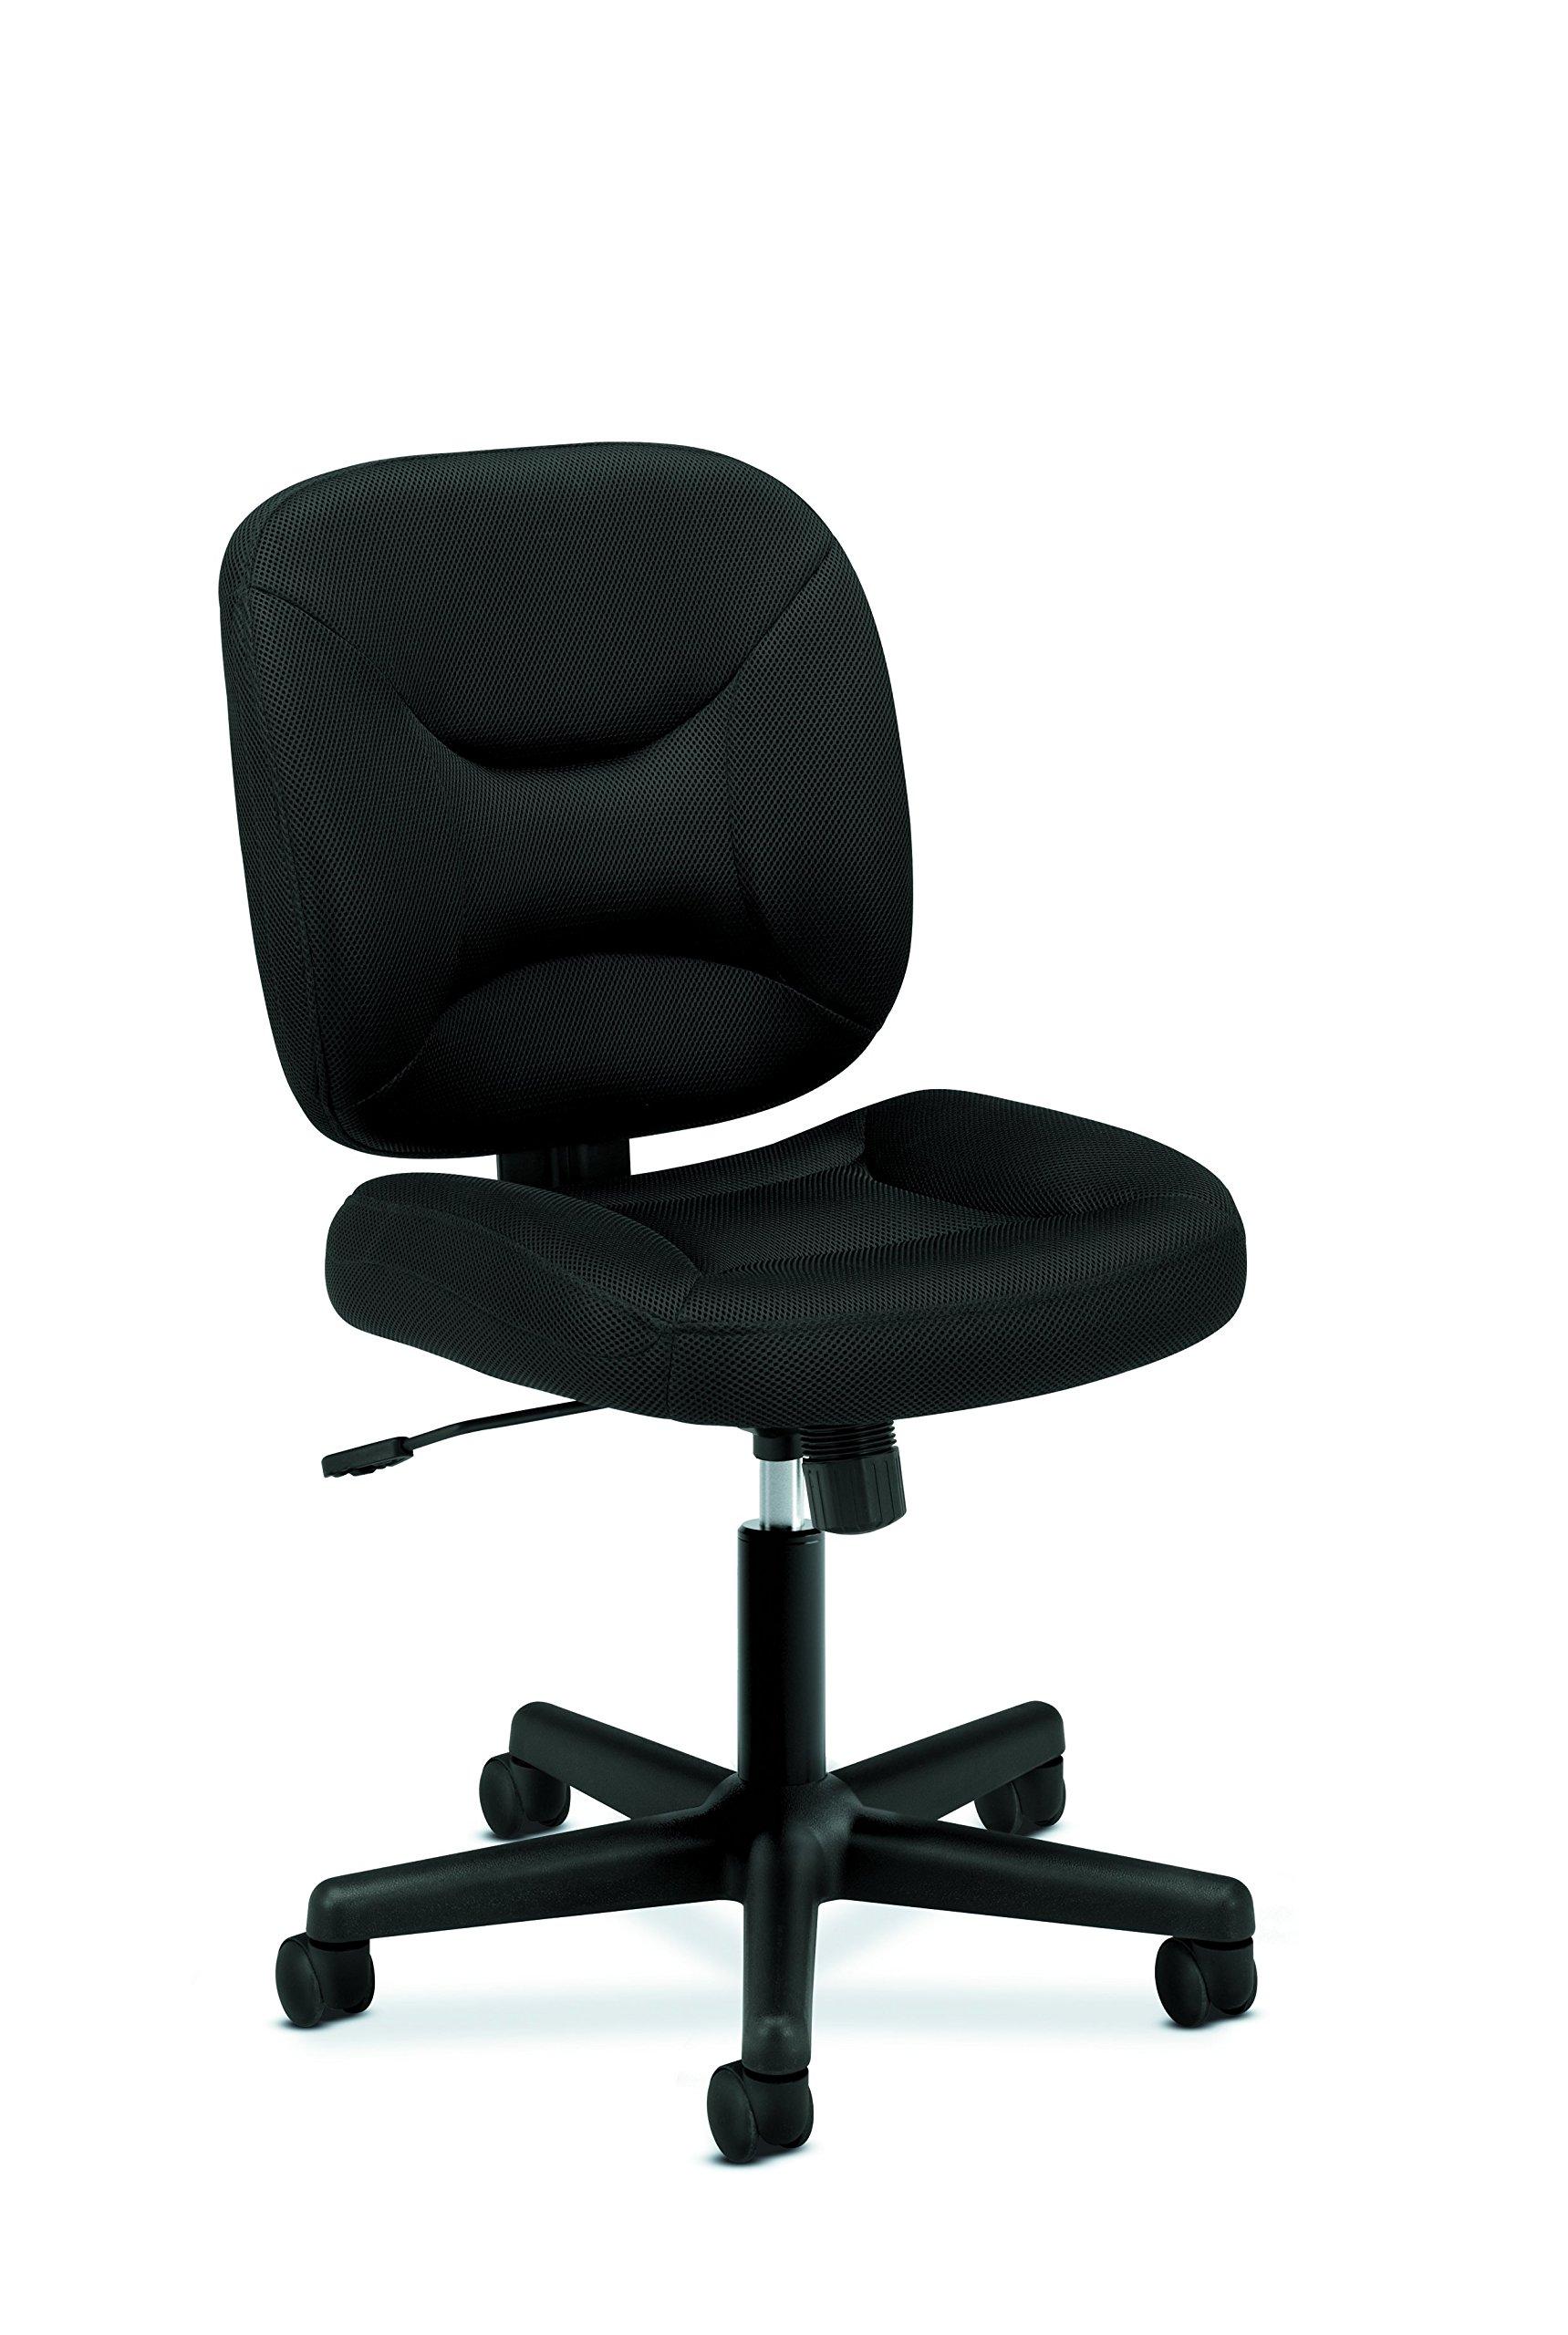 HON ValuTask Low Back Task Chair - Mesh Computer Chair for Office Desk, Black (HVL210) by HON